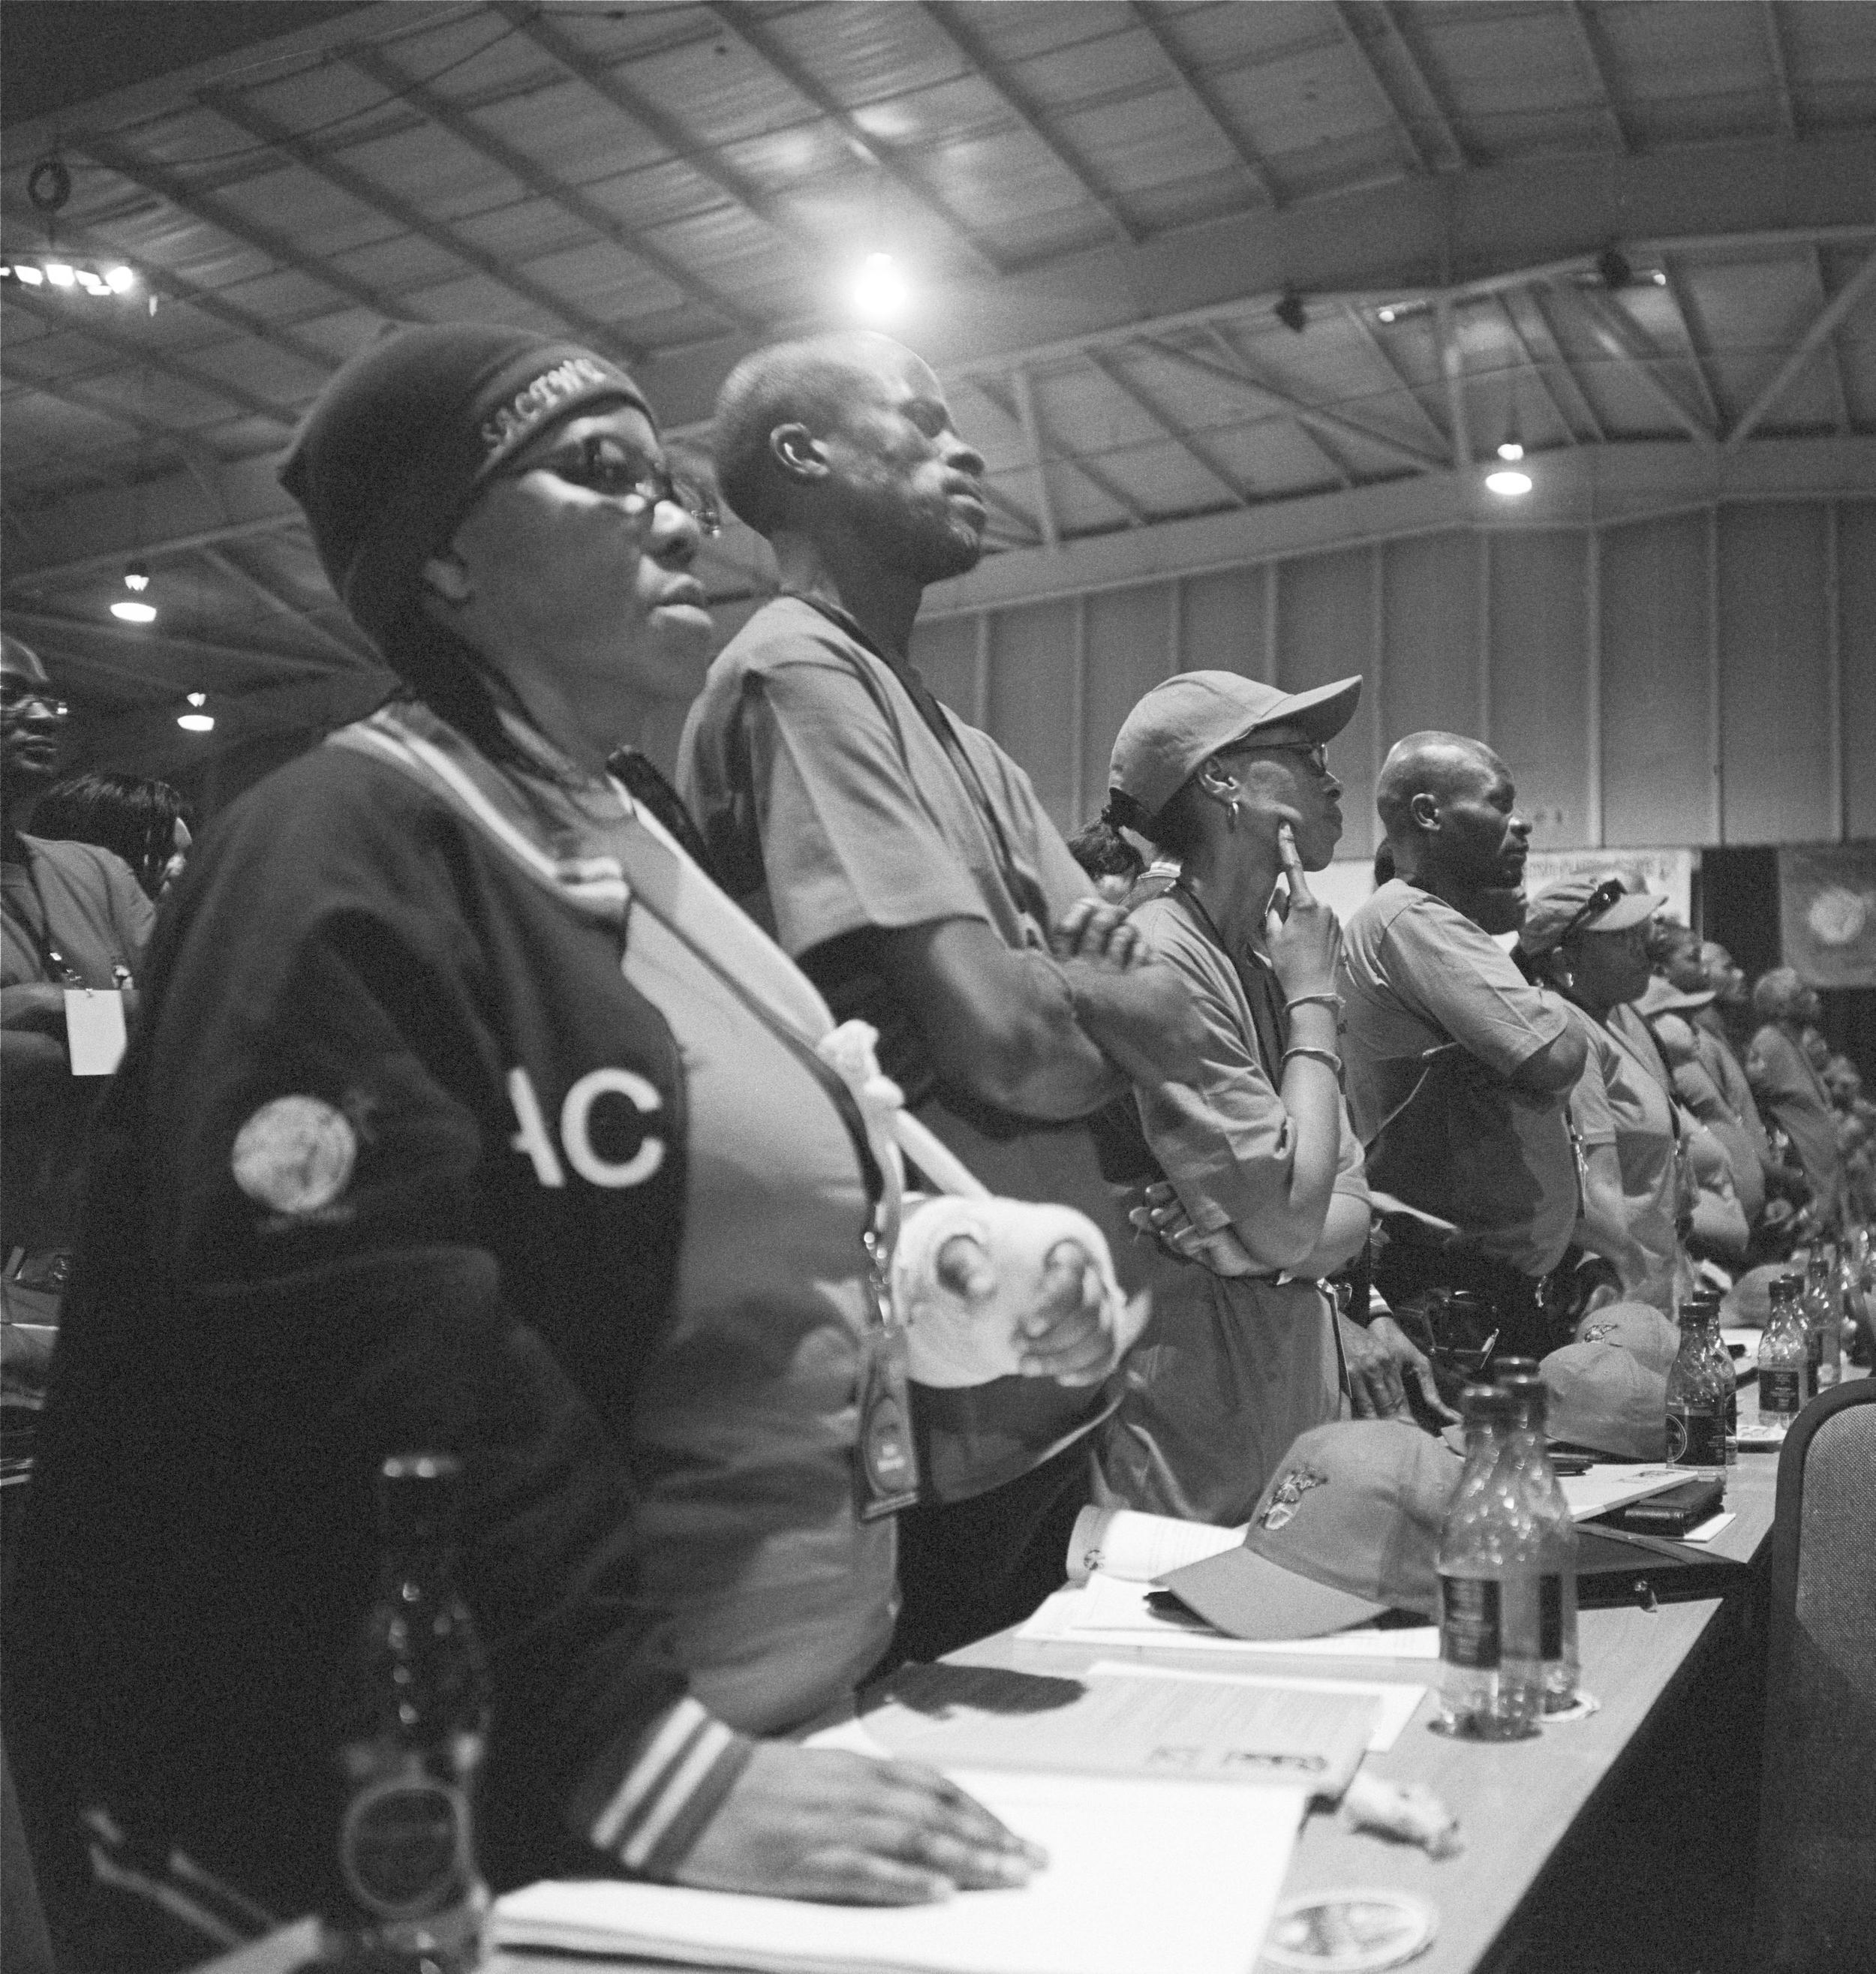 Busisiwe Msimango observing a minute silence, COSATU 10th National Congress, Johannesburg, September 2009